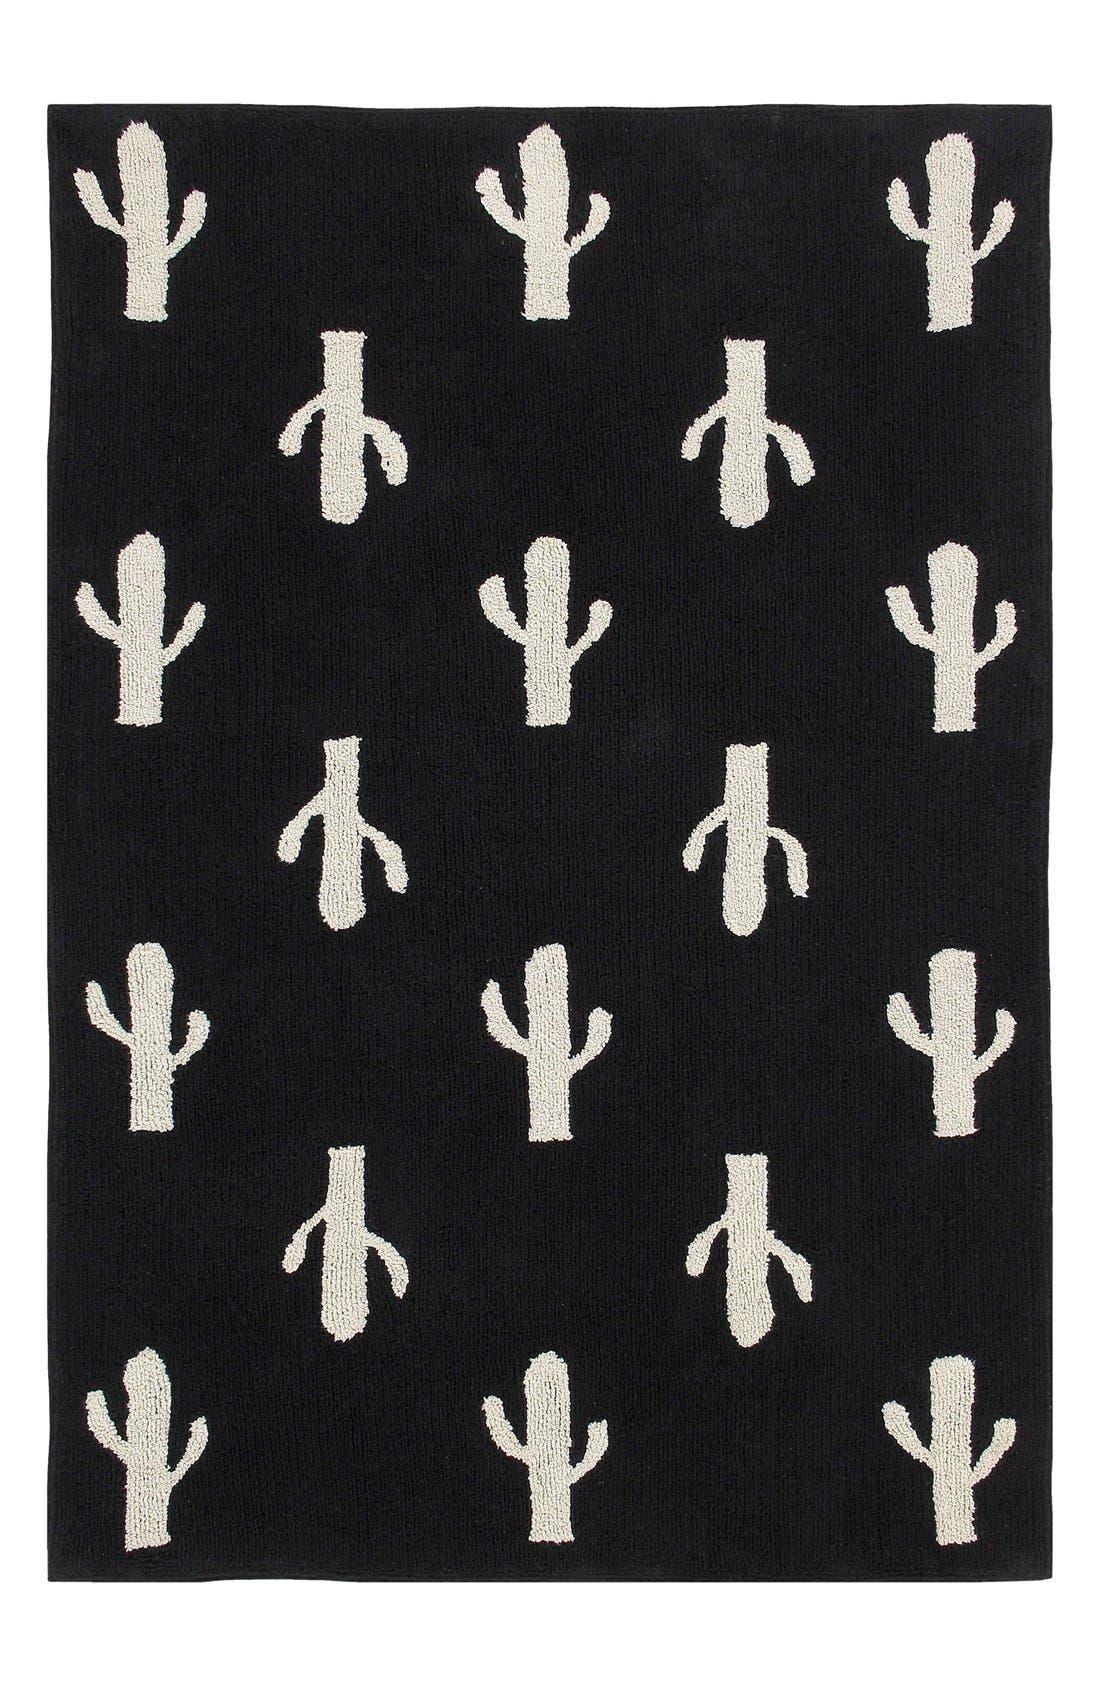 Stamp Rug lorena canals cactus stamp rug | nordstrom